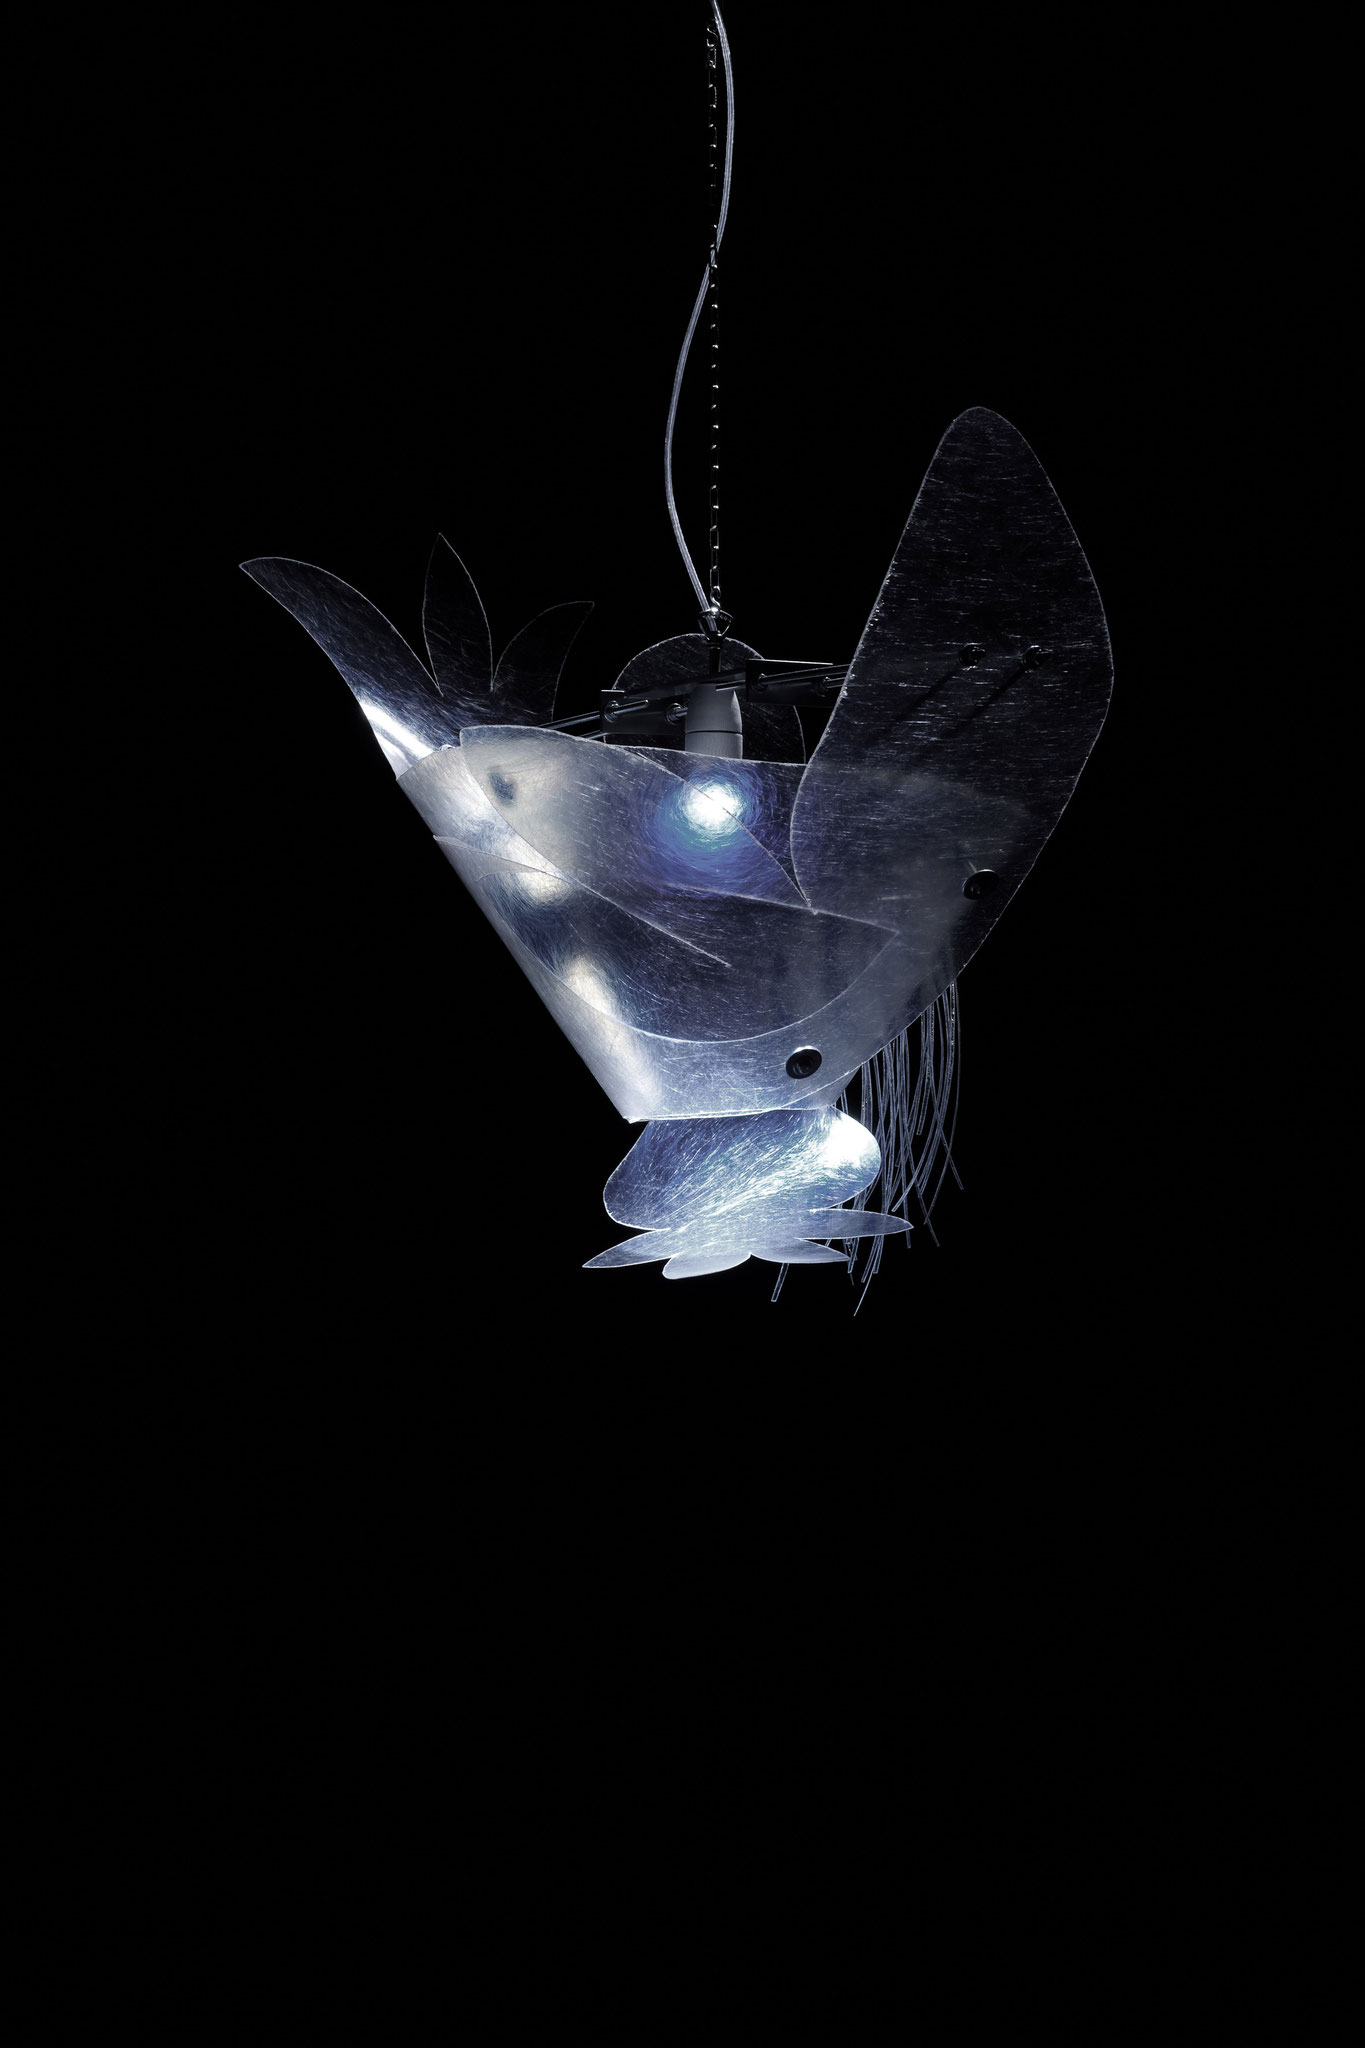 Lichtbringer 05     Lightning - lampshade